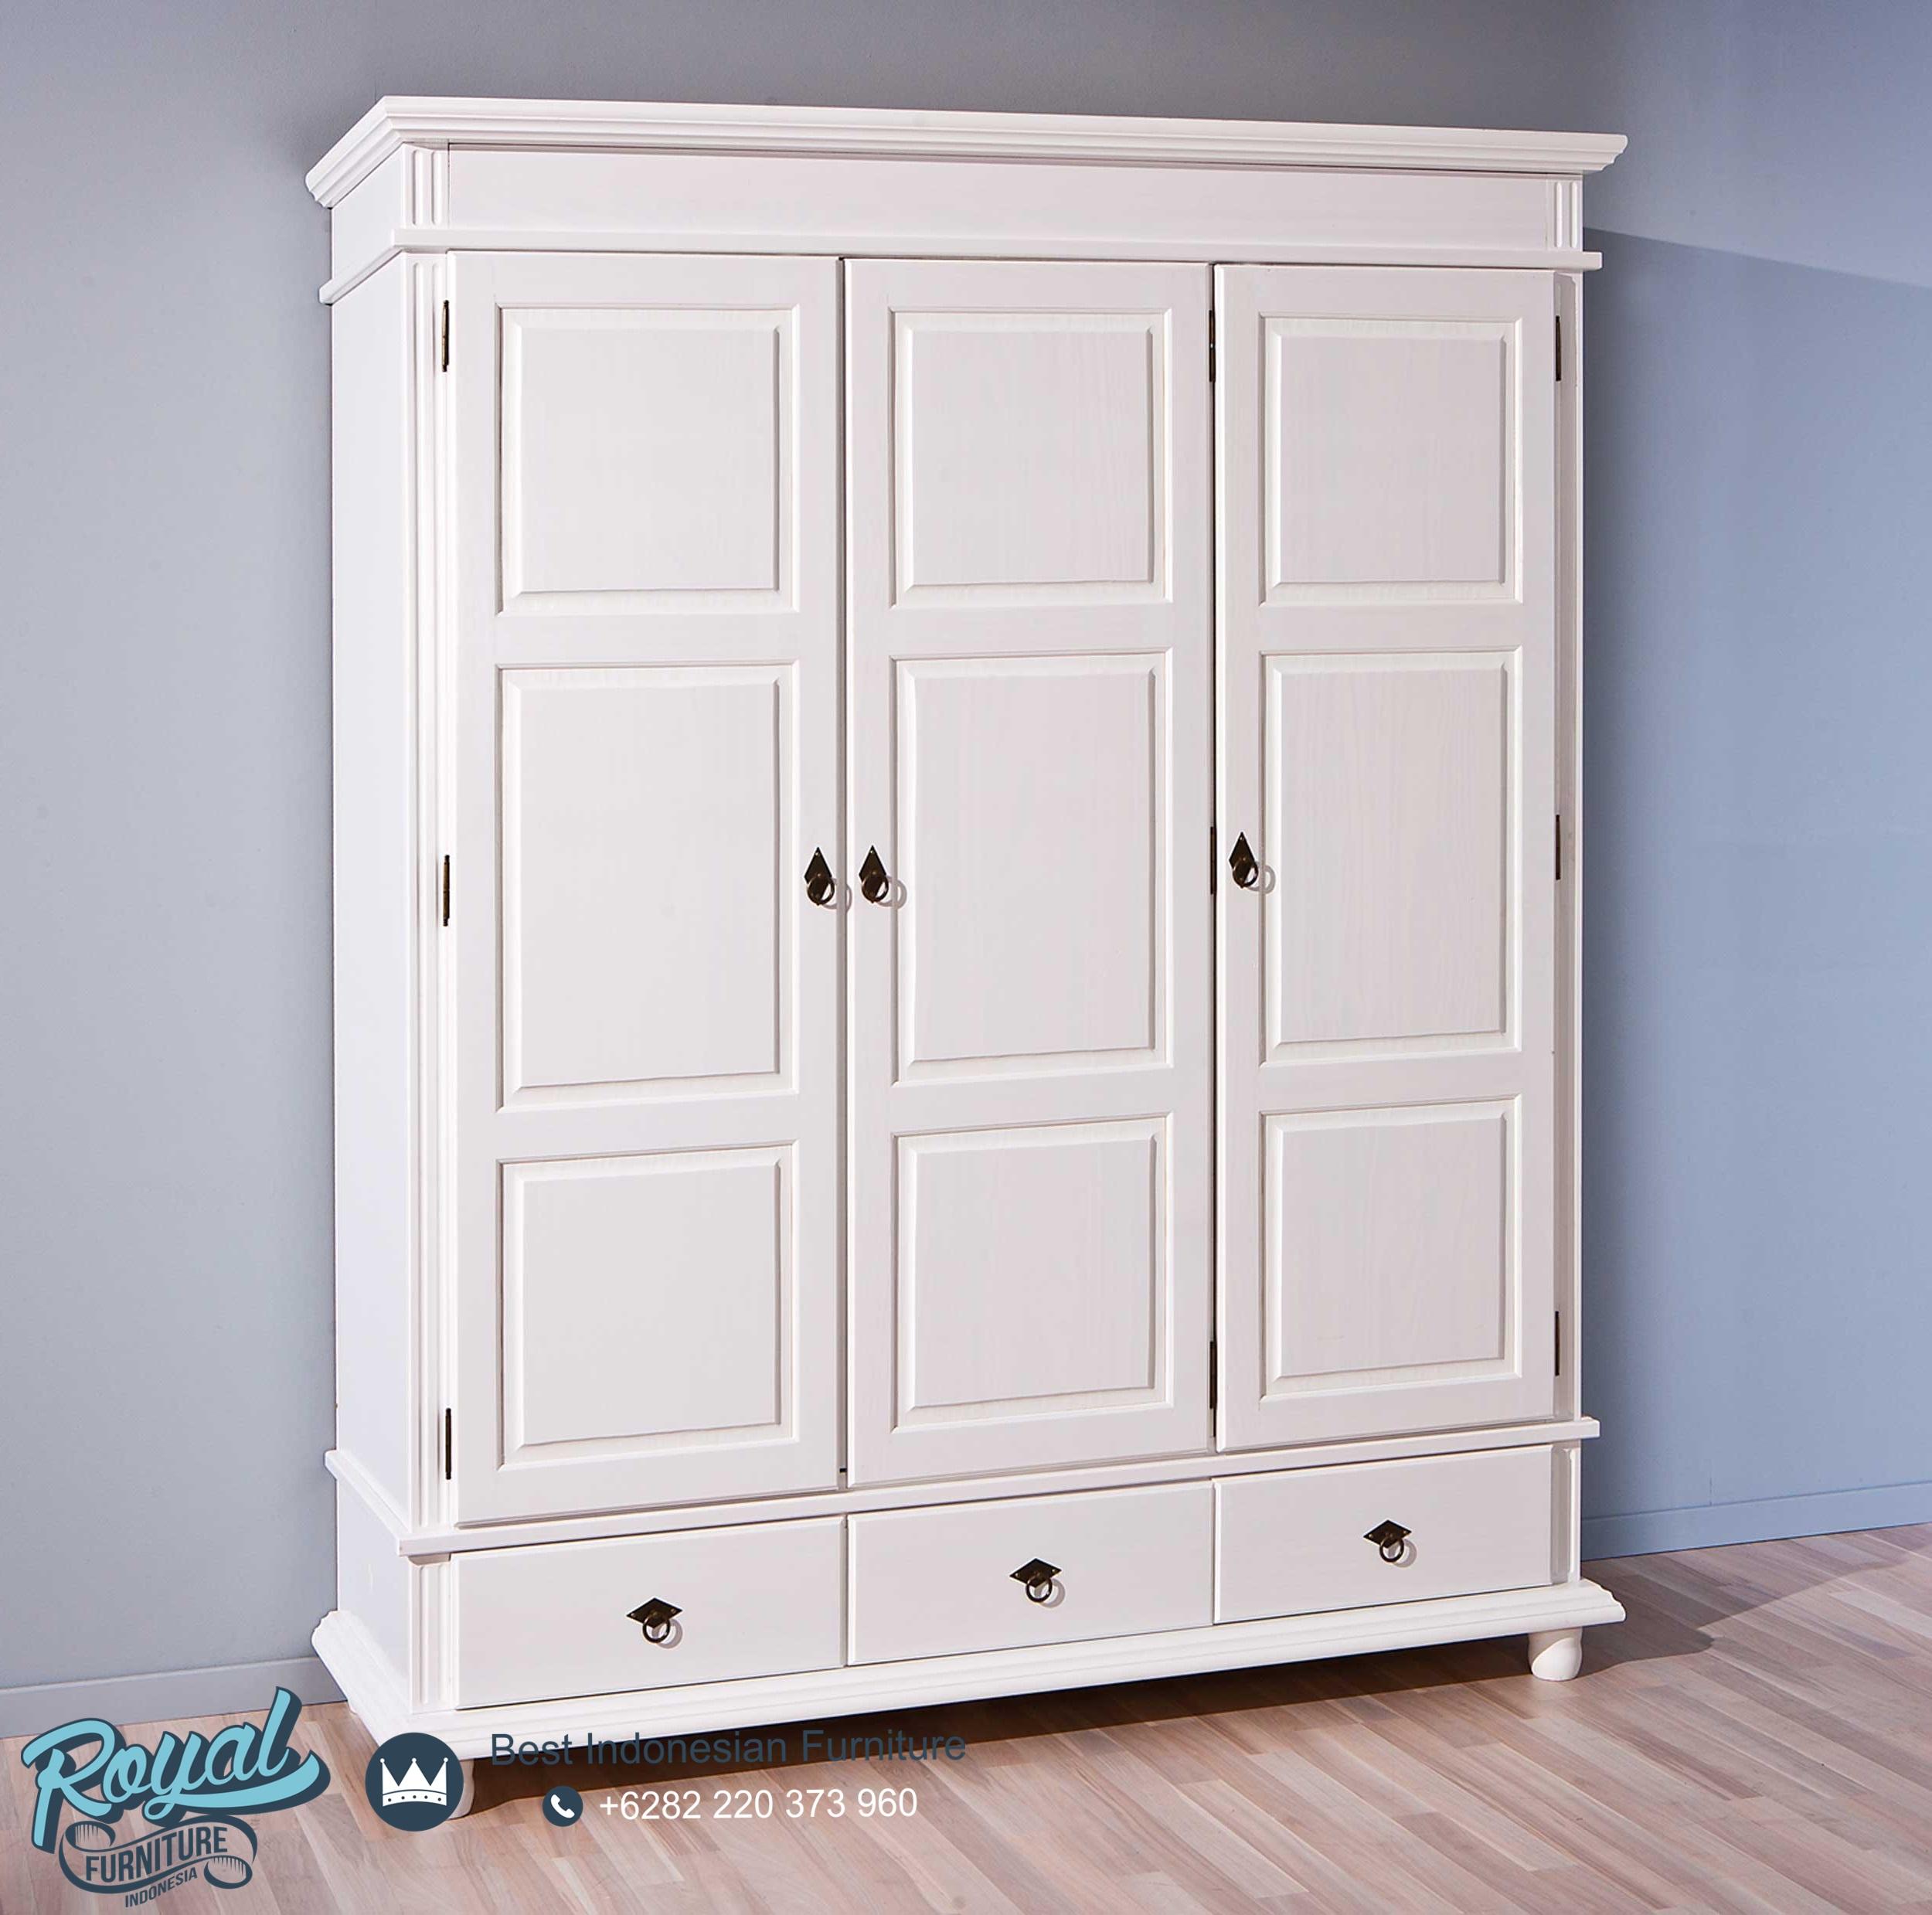 Almari Pakaian 3 Pintu Minimalis Kayu Jepara Putih Duco, desain lemari pakaian minimalis modern, lemari pakaian minimalis 3 pintu, lemari pakaian kayu minimalis, lemari pakaian jati, lemari pakaian 2 pintu, lemari pakaian 3 pintu, lemari pakaian sliding, lemari minimalis 2 pintu, almari pakaian minimalis, harga lemari pakaian minimalis, jual lemari pakaian kayu minimalis, lemari baju minimalis 3 pintu, lemari baju geser minimalis, lemari baju kayu jati, model lemari pakaian minimalis jepara terbaru, lemarei baju 4 pintu, lemari kayu jati, mebel jepara, furniture jepara, royal furniture